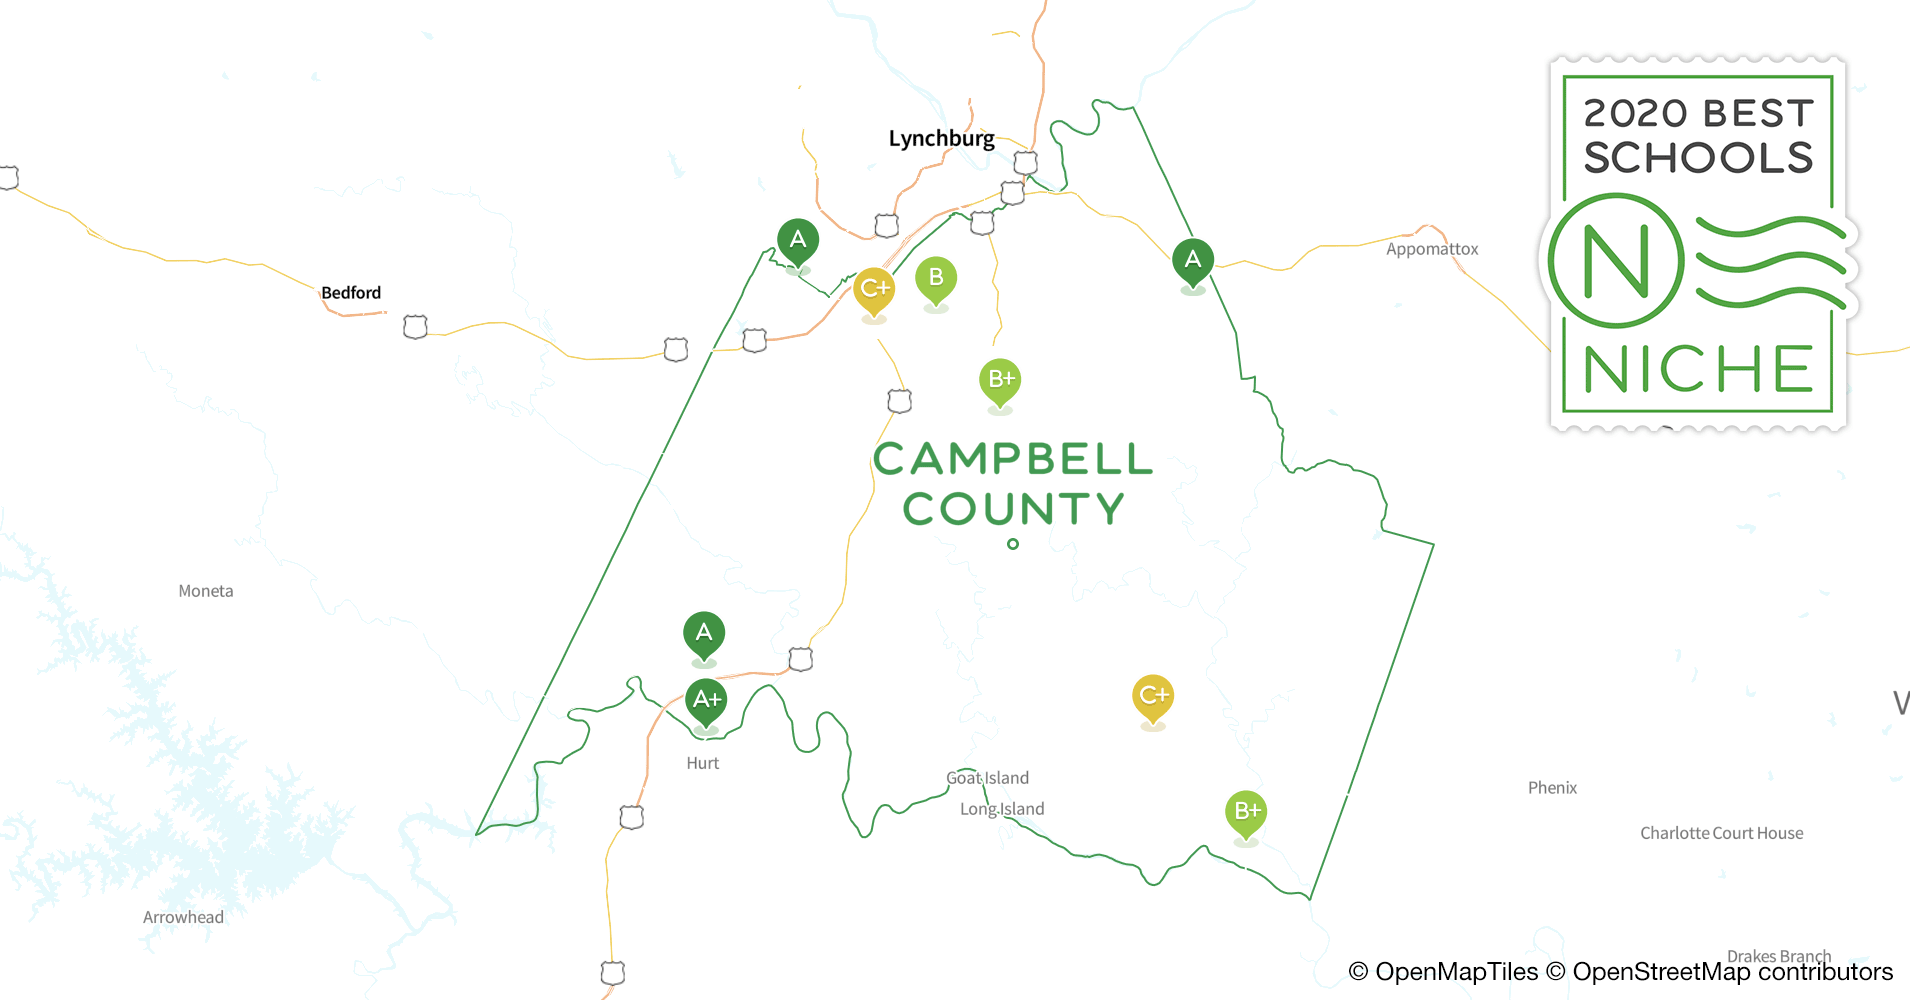 2020 Best Public Elementary Schools in Campbell County, VA